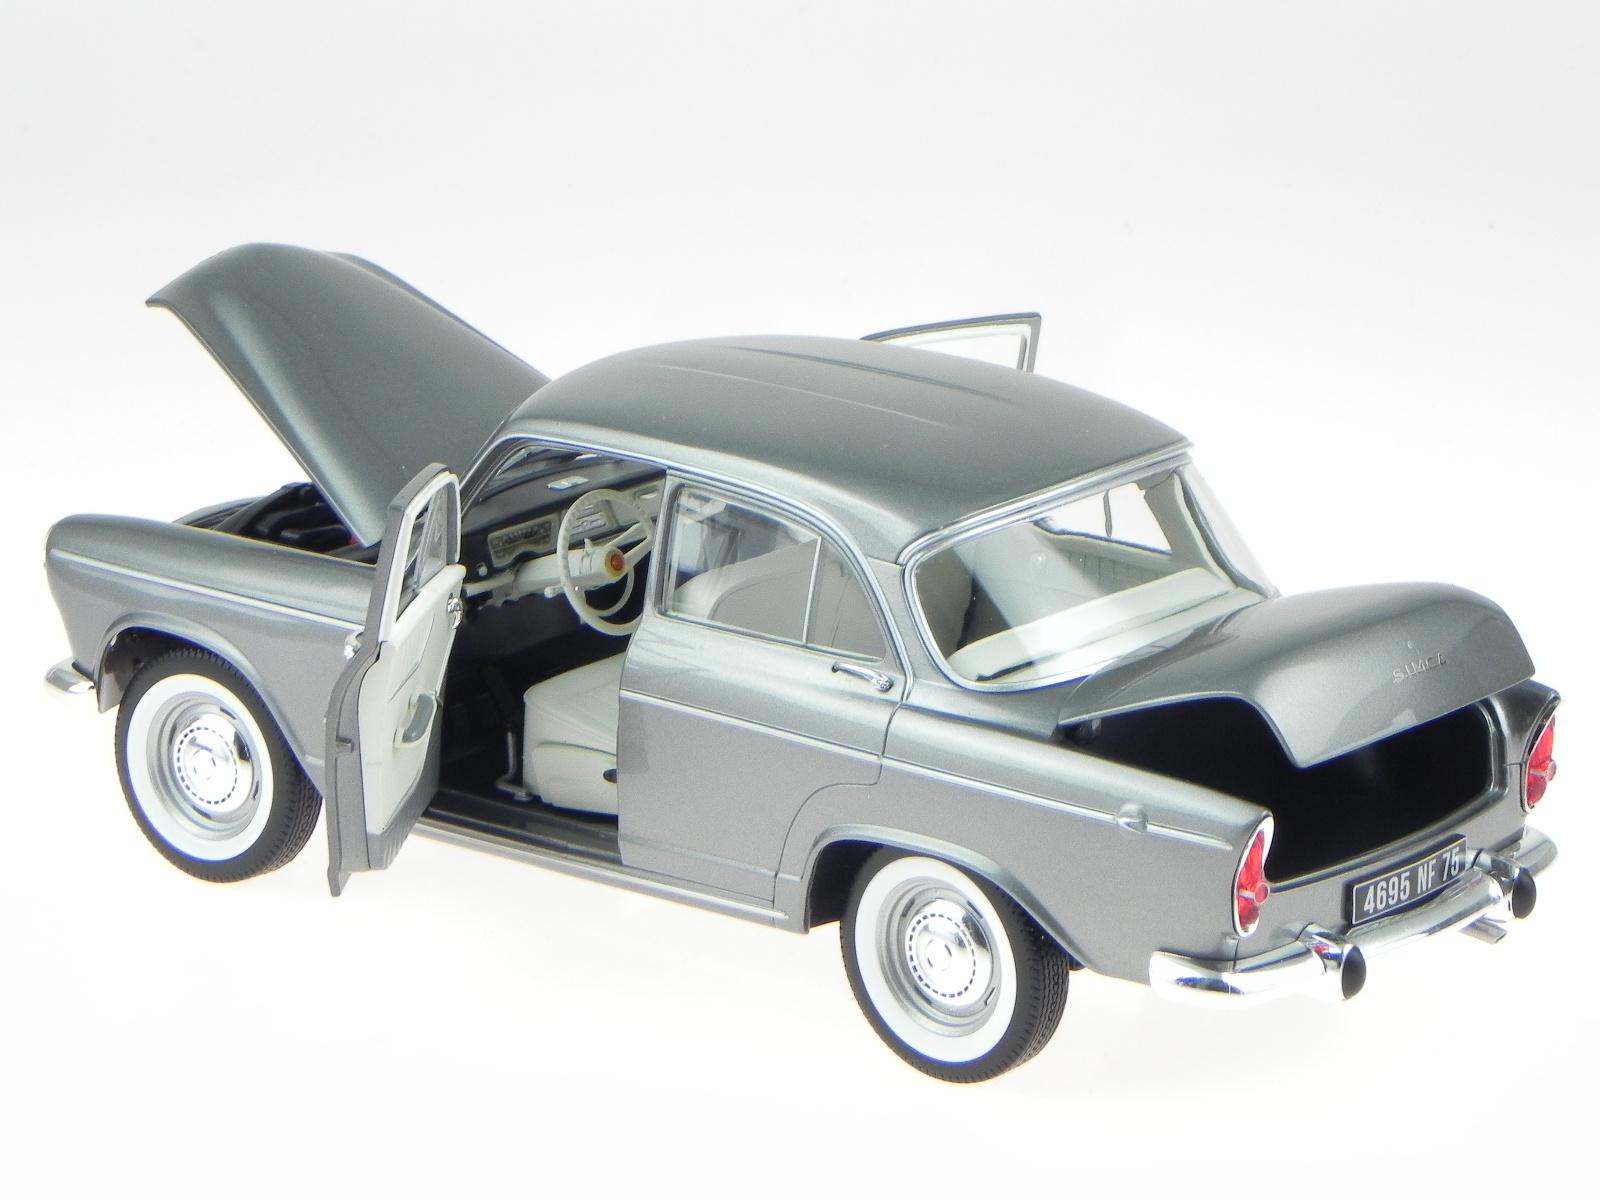 Norev Modellauto 1:18 Simca Aronde Monthlery Speciale 1962 grau metallic